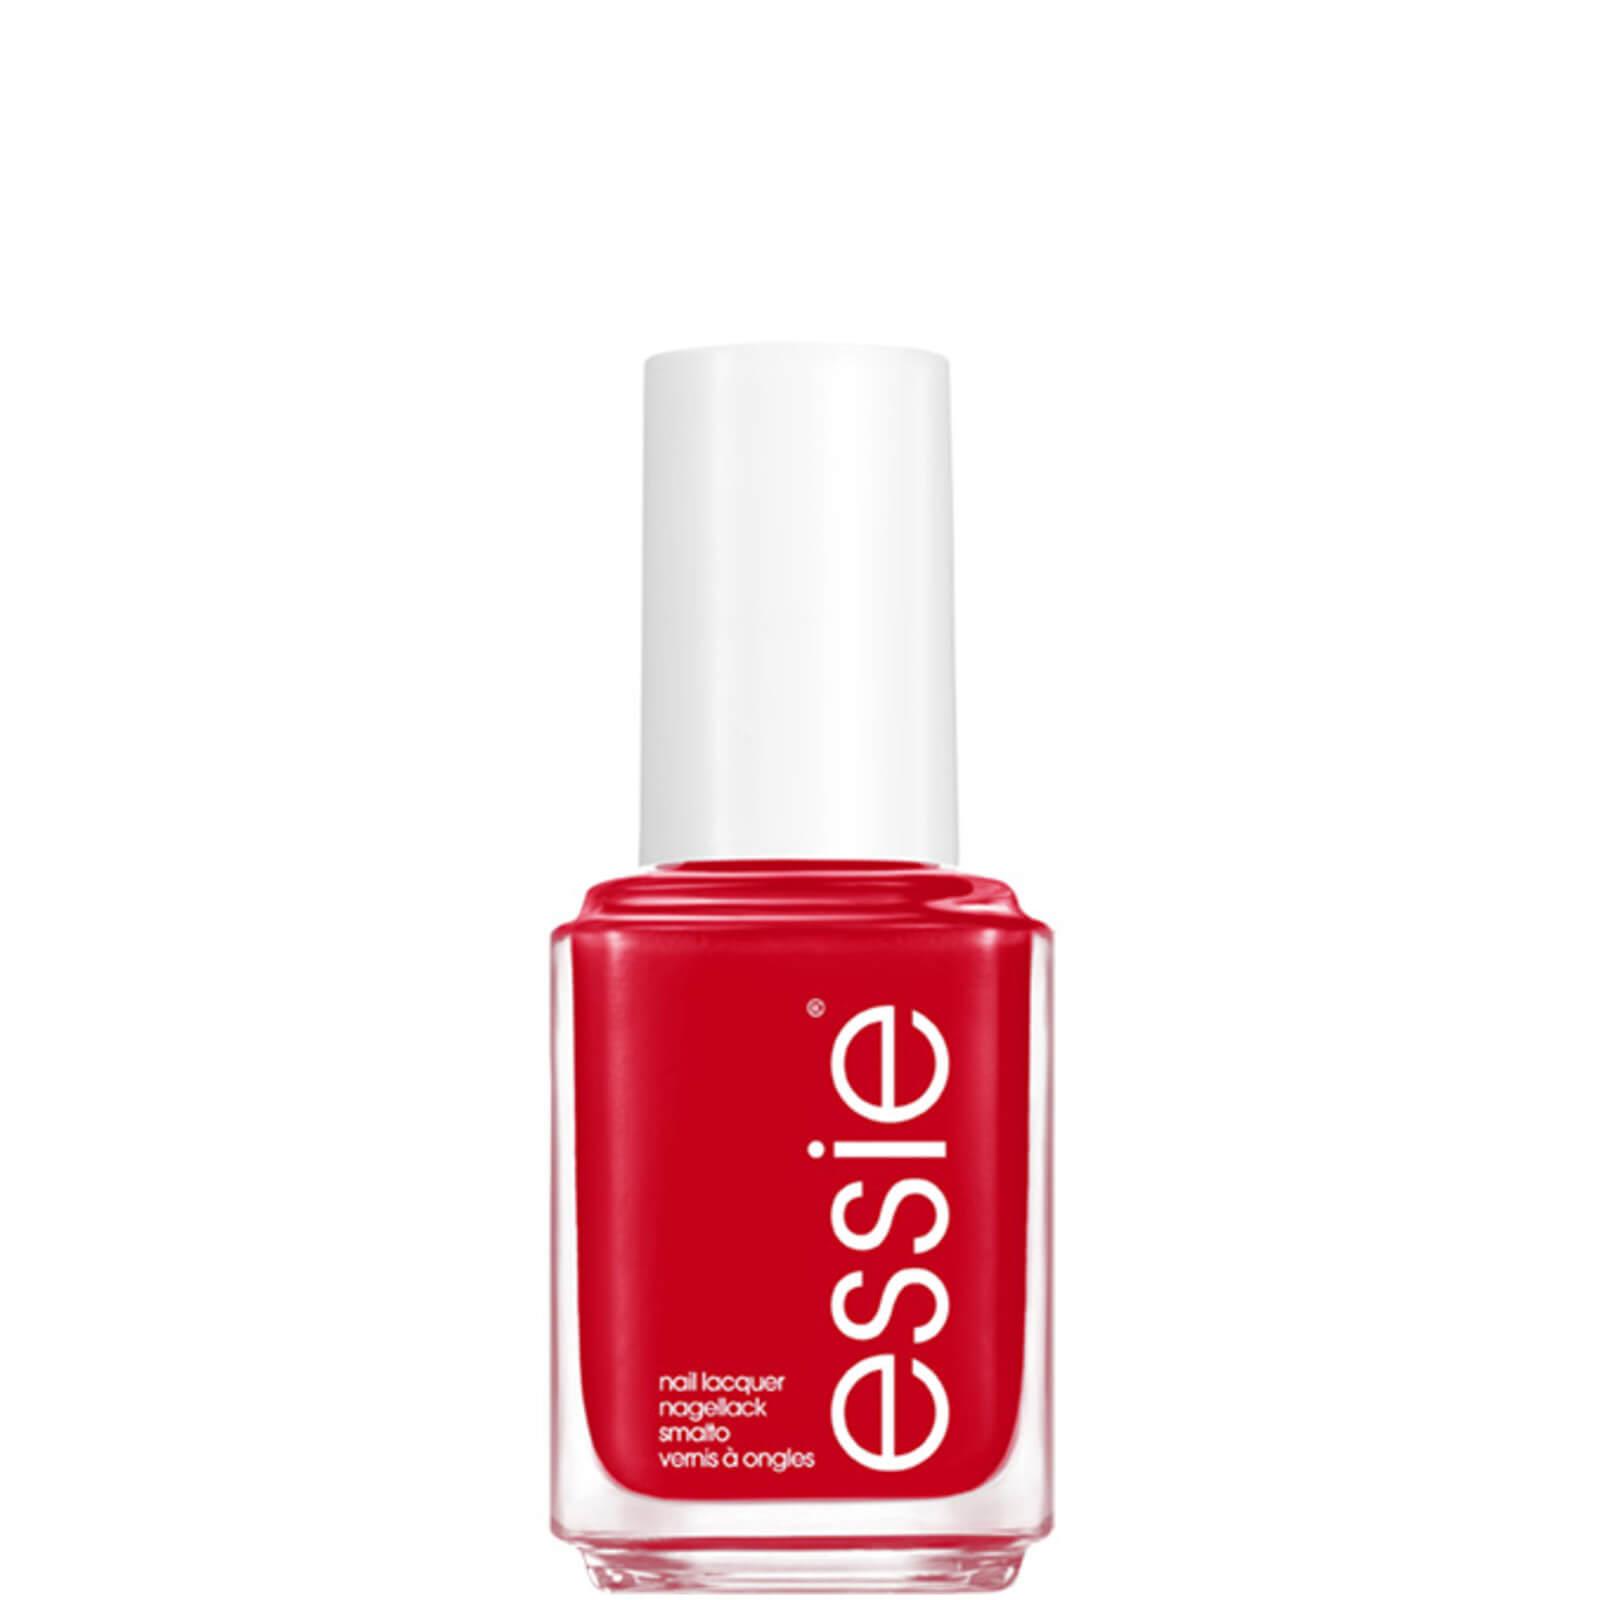 Купить Essie Original Nail Polish 13.5ml (Various Shades) - 750 Not Red-Y for Bed